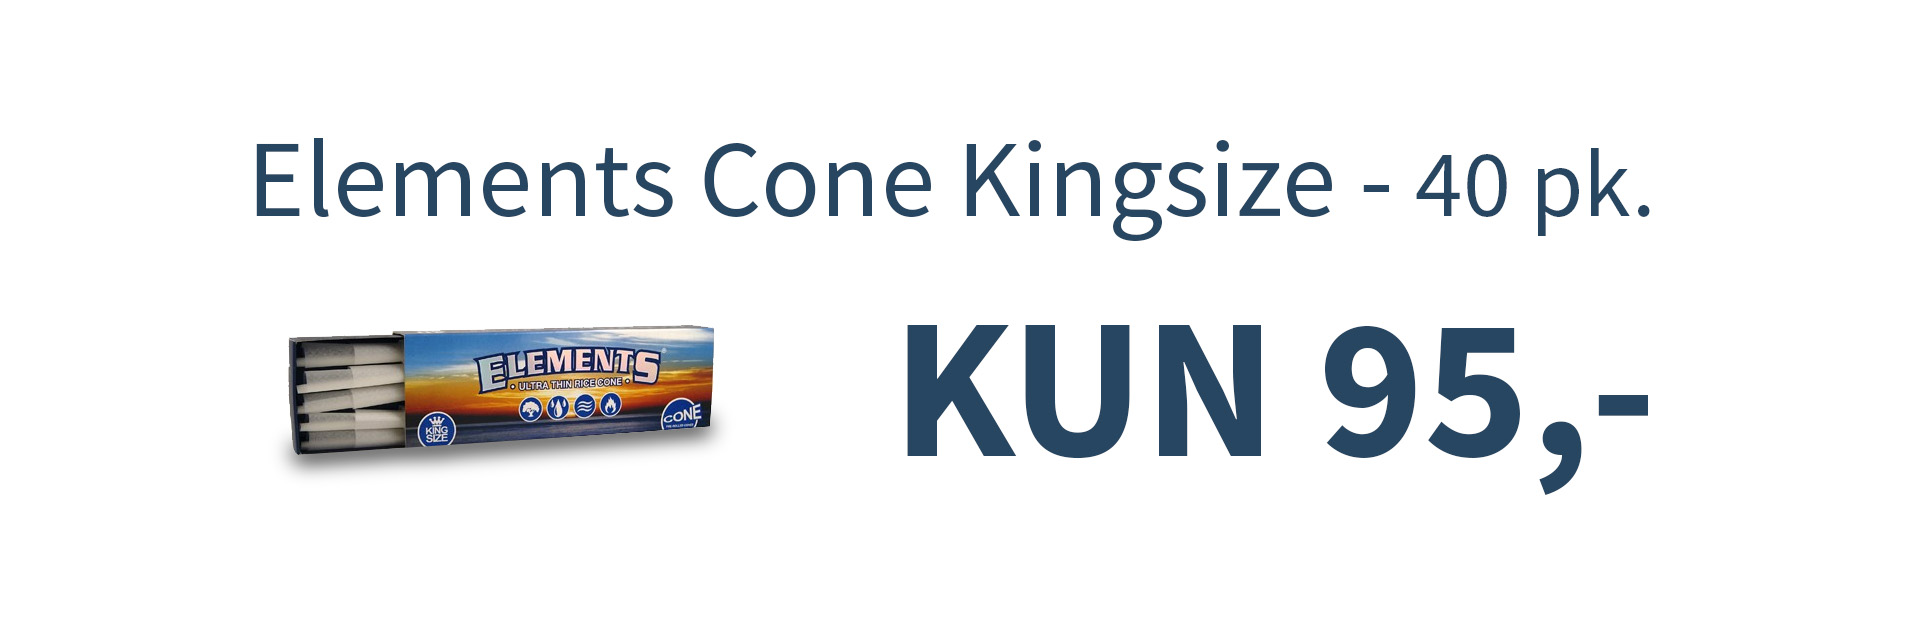 Banner: Elements Cone Kingsize - 40 pk. til kr. 95,-